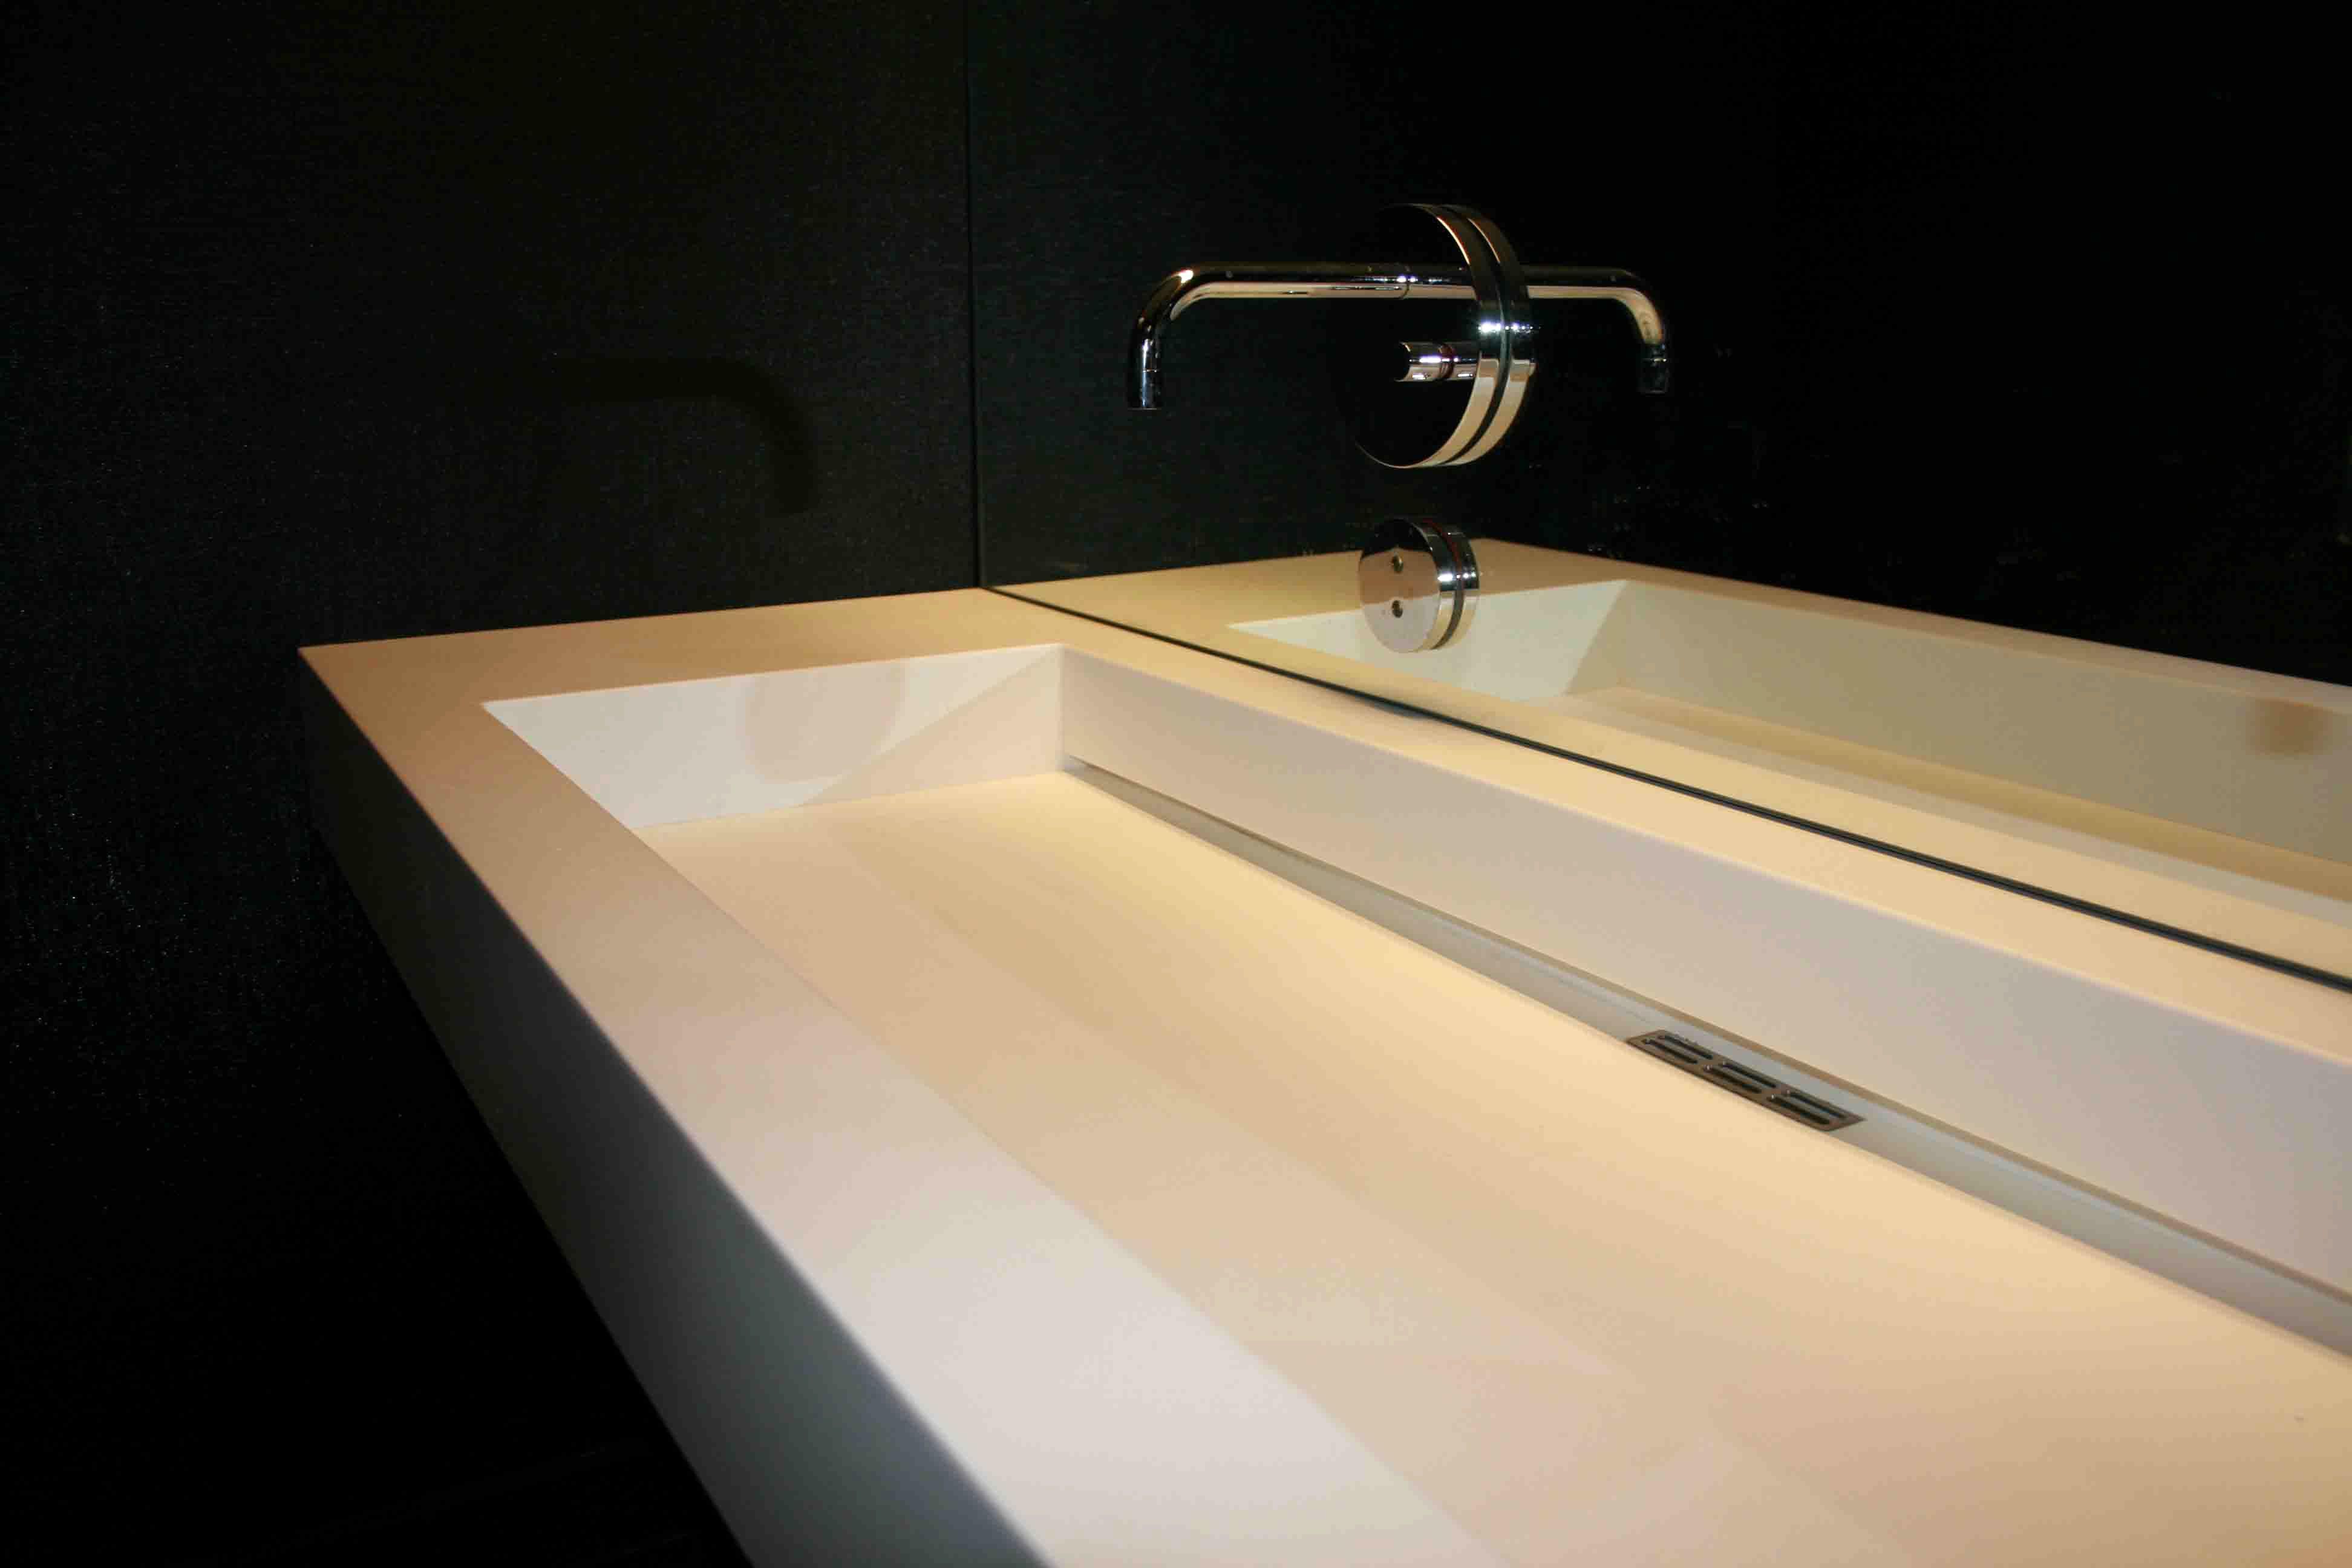 22 Famous Kohler Bathroom Sinks Ceplukan Trough Sink Small Bathroom Sinks Kohler Bathroom Sink